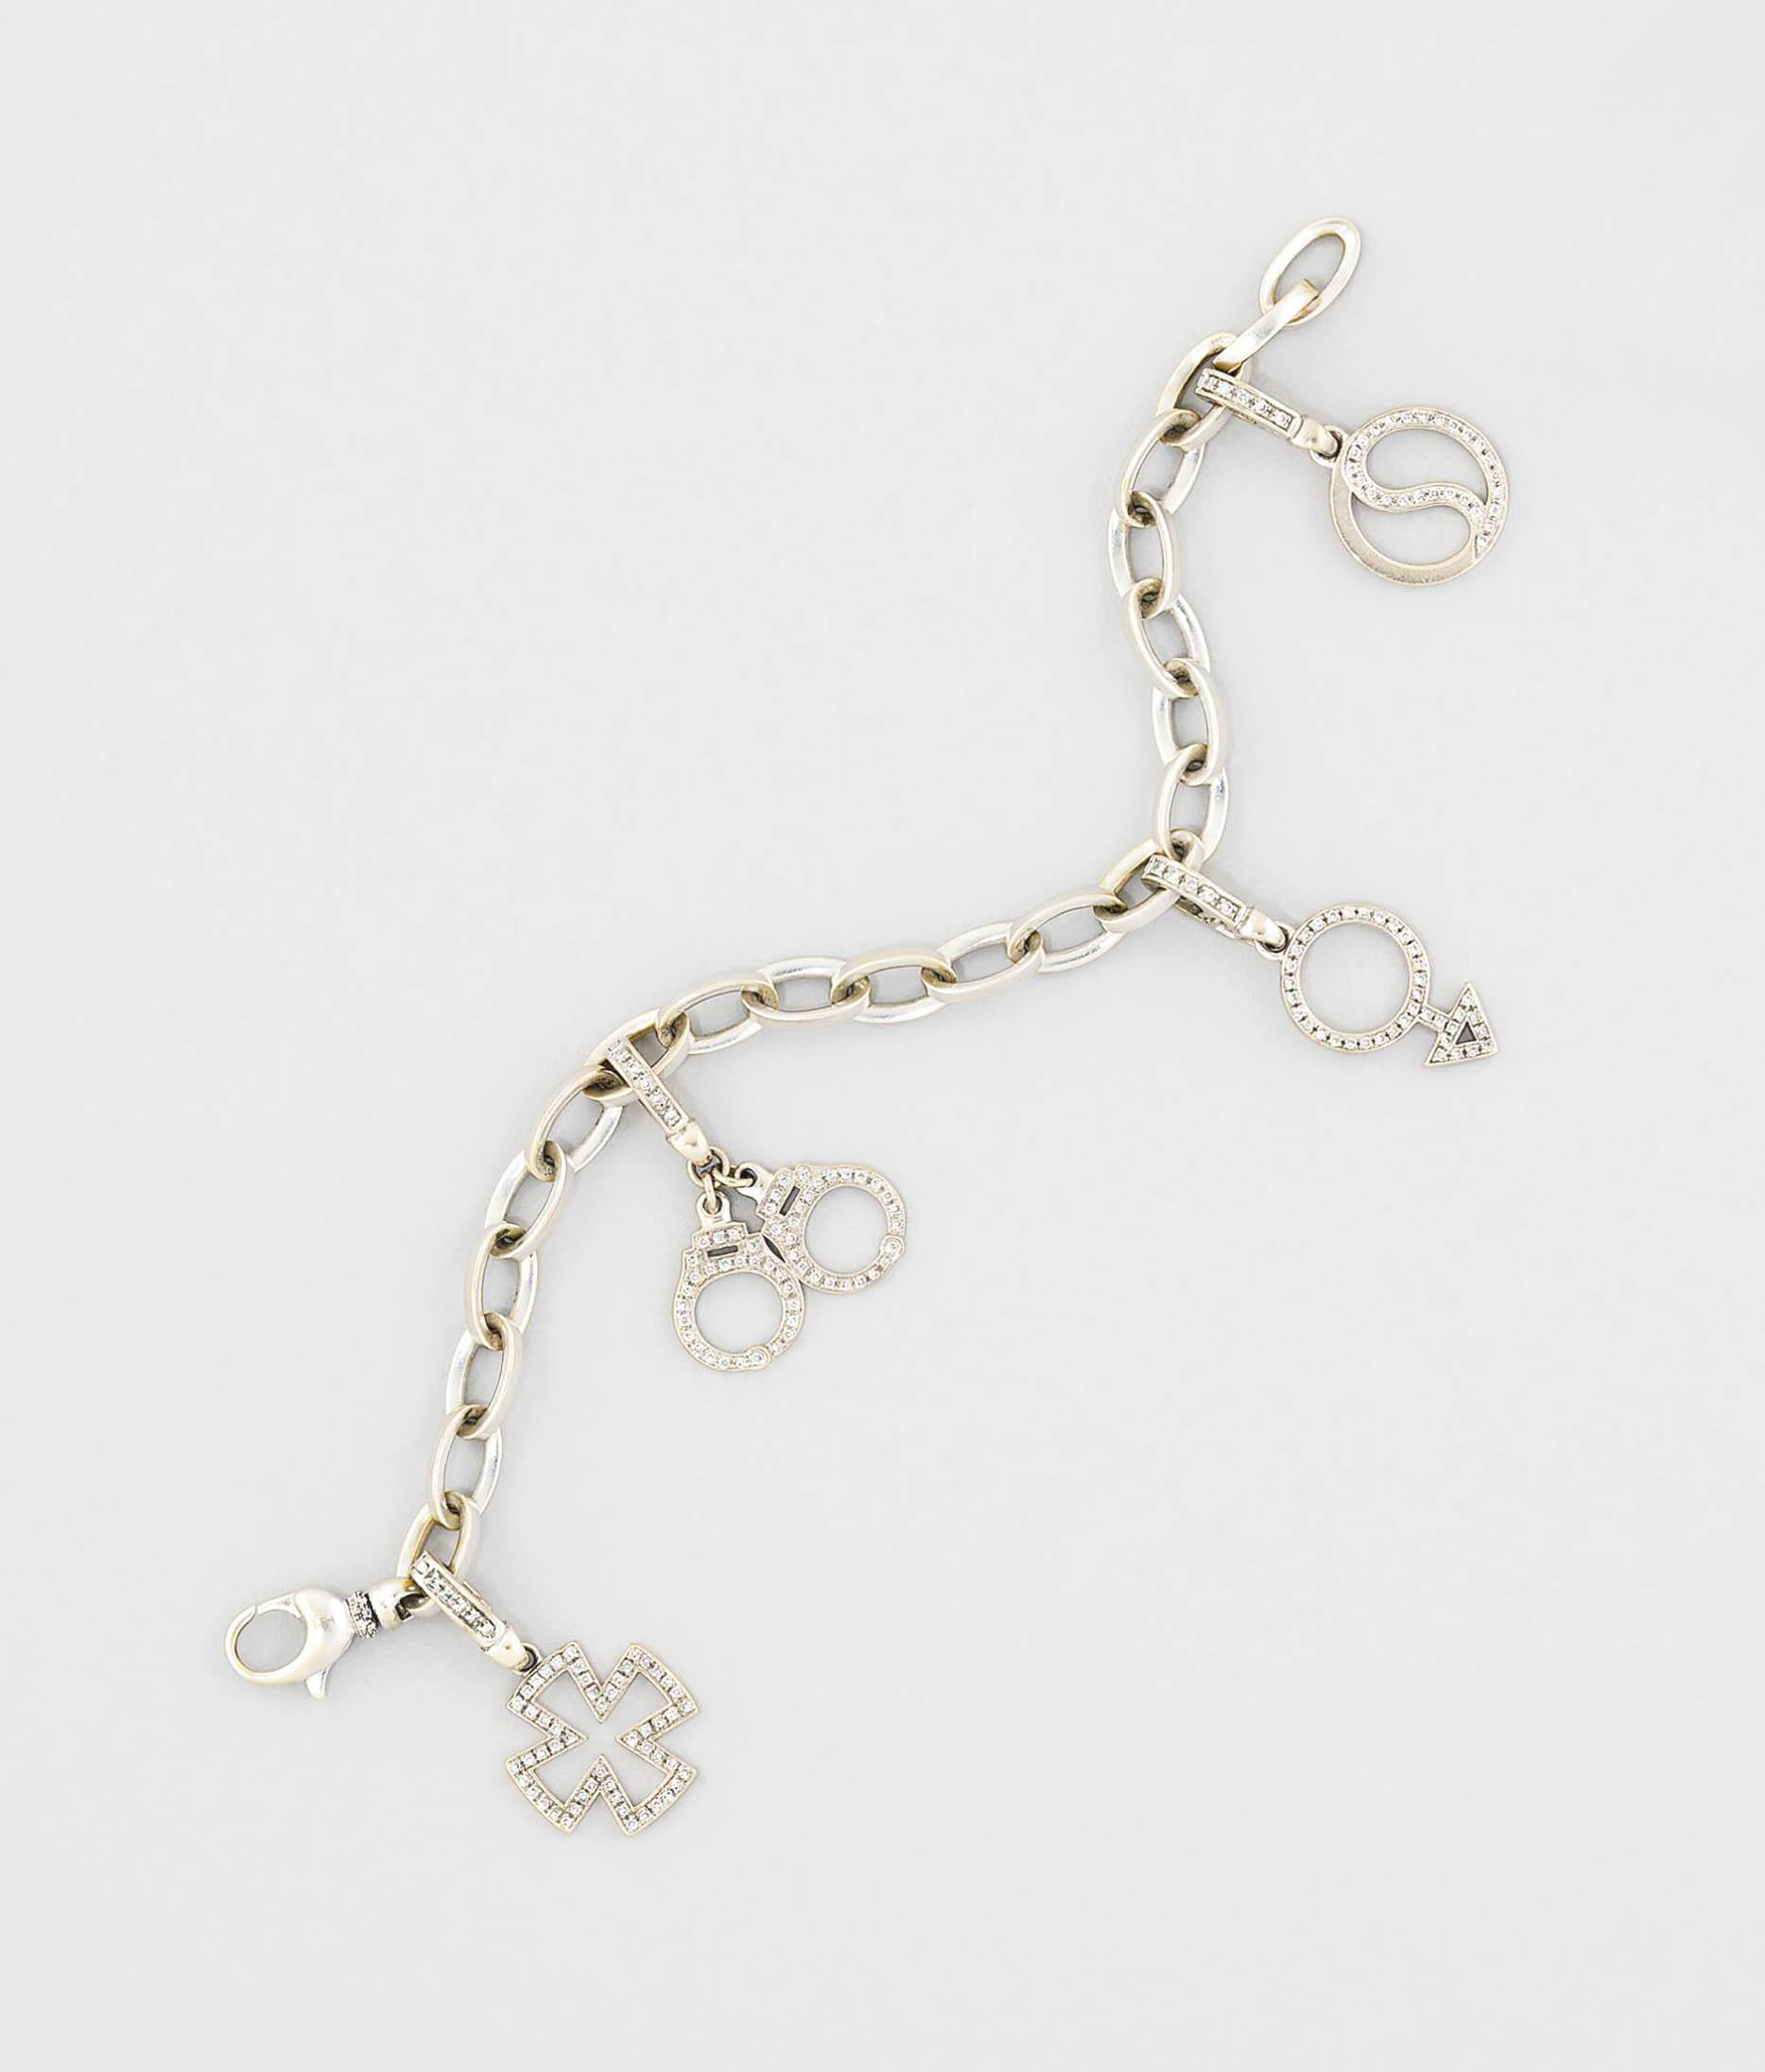 A diamond charm bracelet, by T